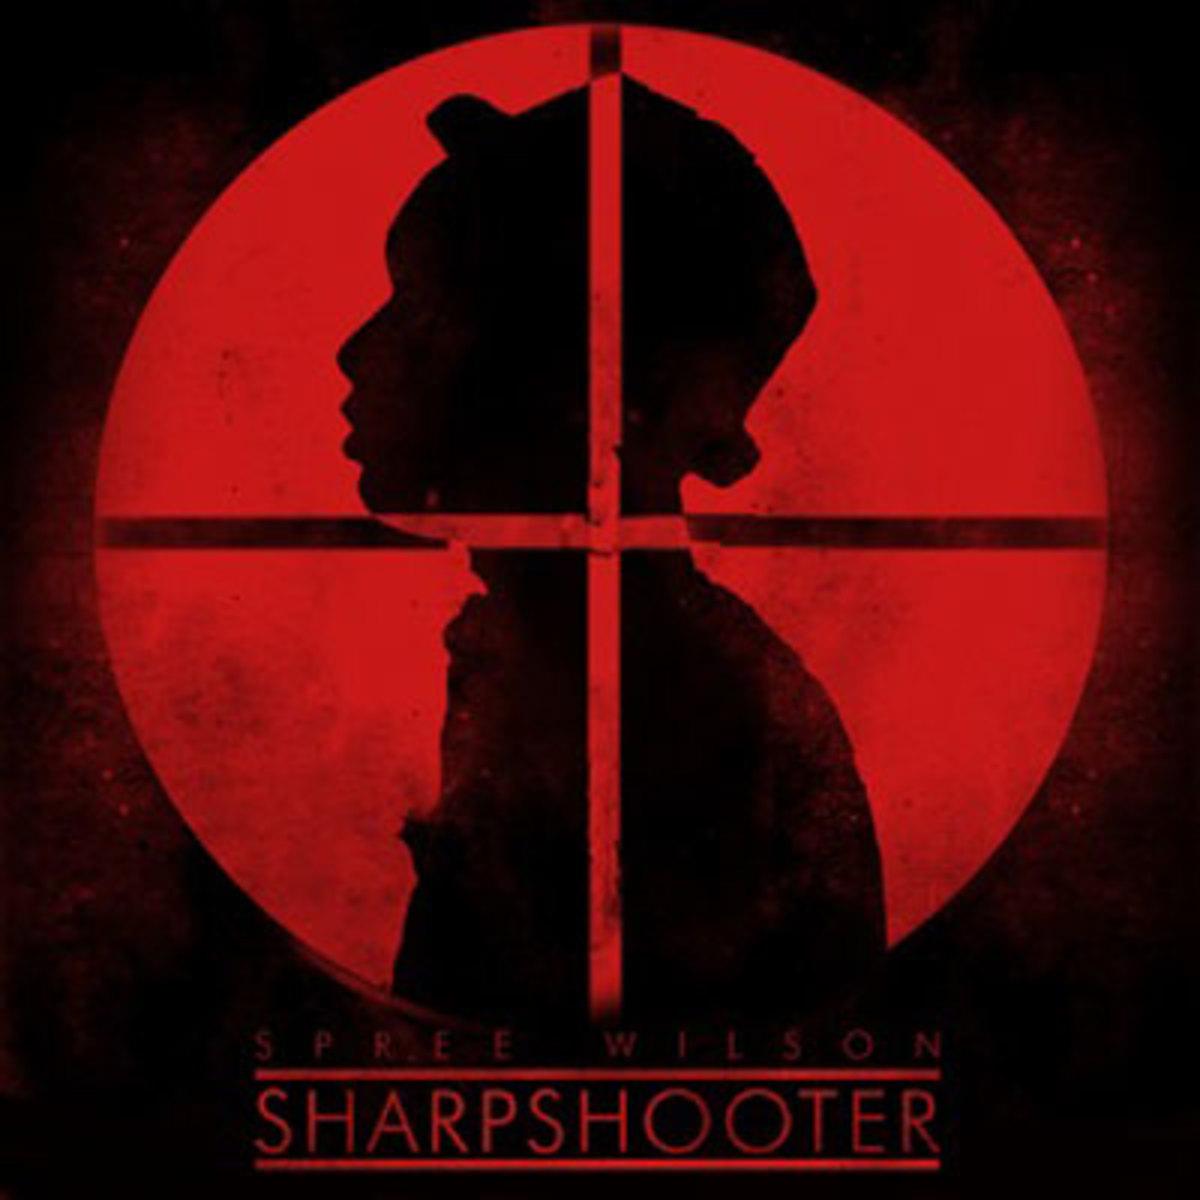 spreewilson-sharpshooter.jpg